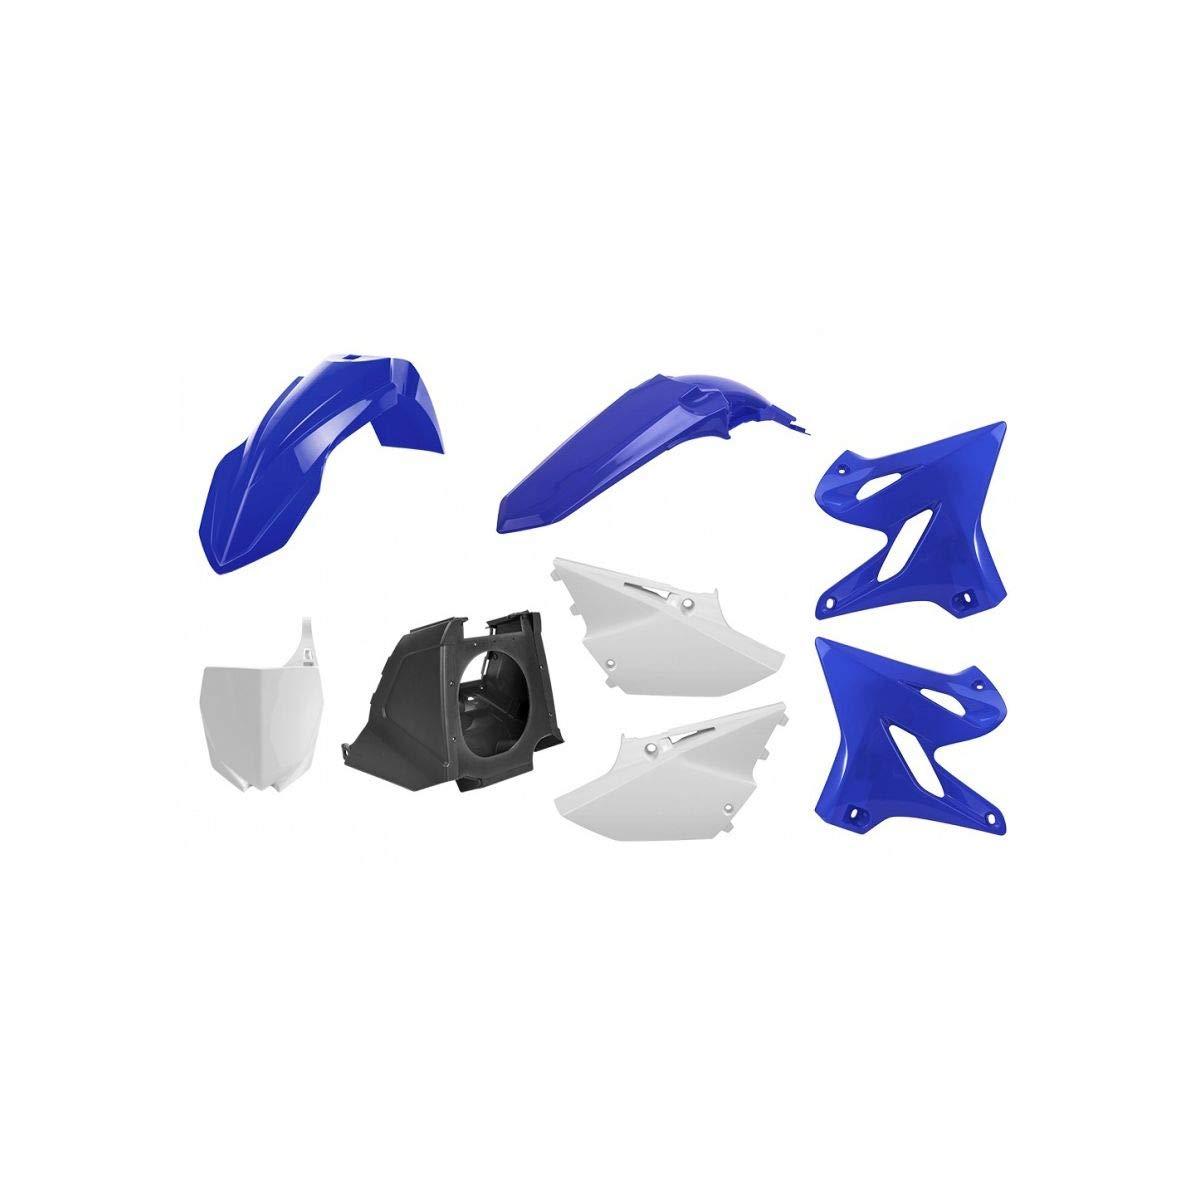 02-19 YAMAHA YZ250 OEM Color Polisport Yamaha Complete Restyle Kit